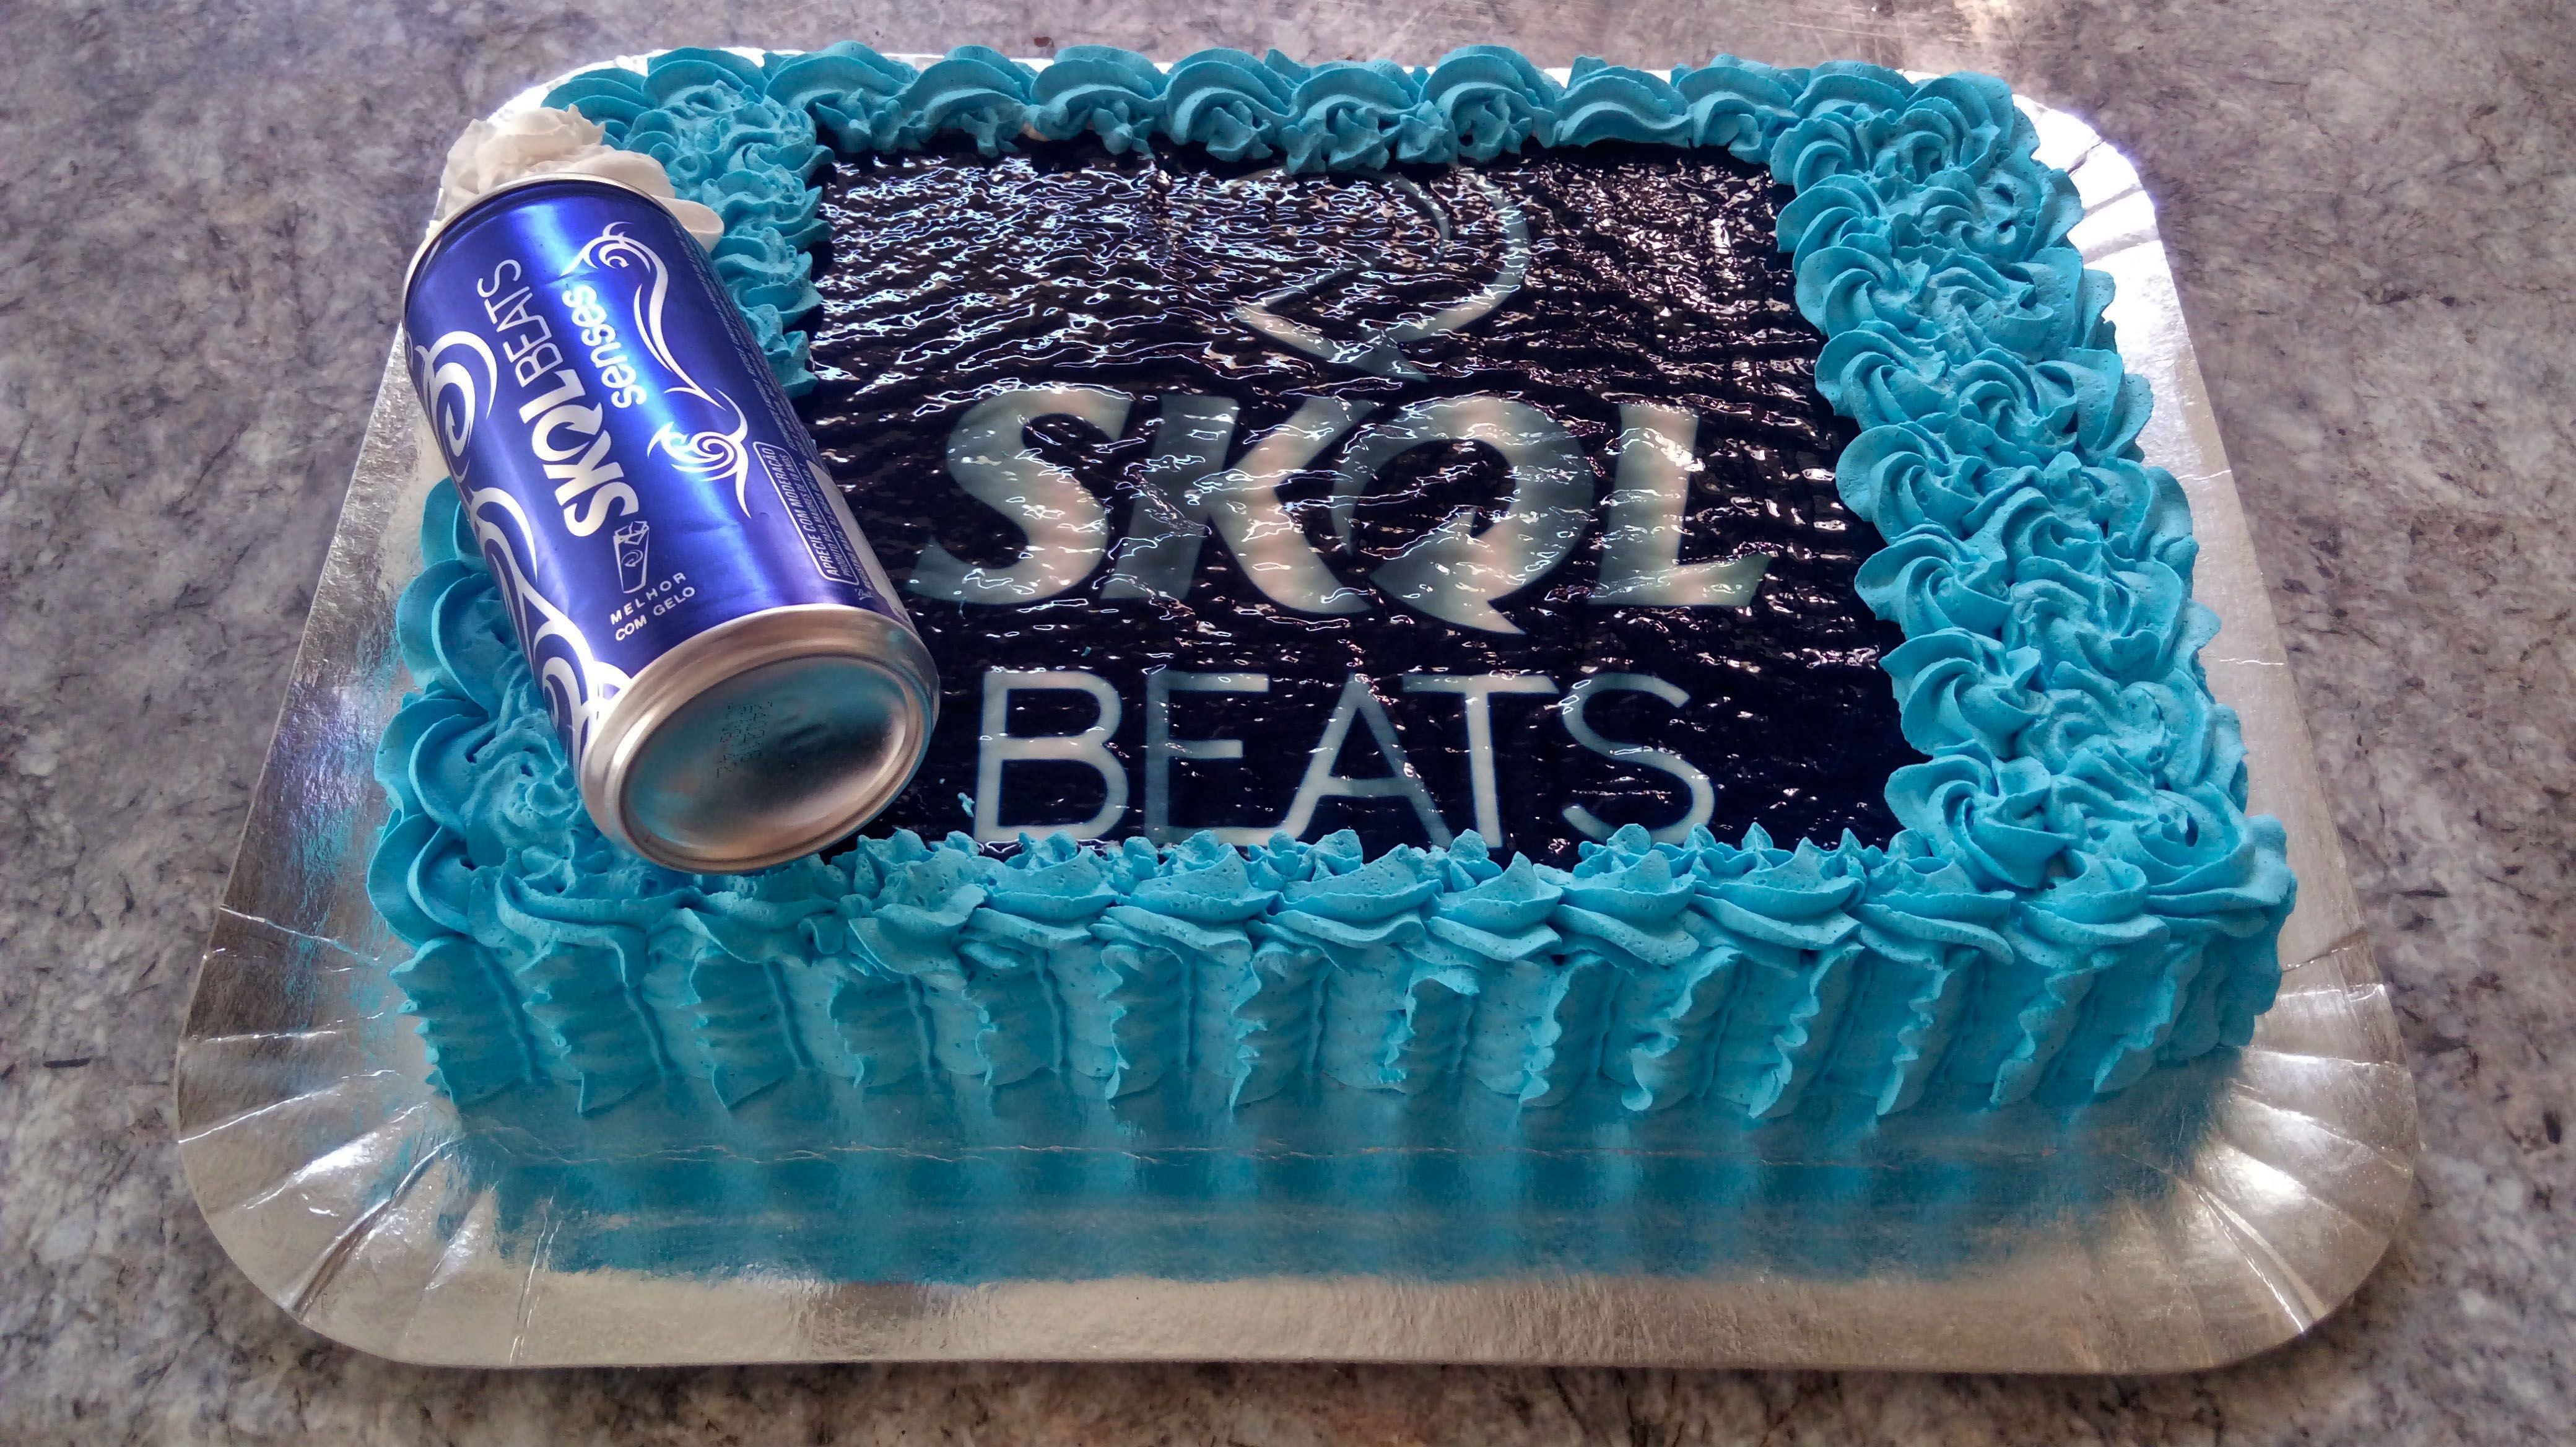 Favoritos Bolo Skol Beats! | Bolos - Cerveja | Pinterest | Bolo skol beats  JI76